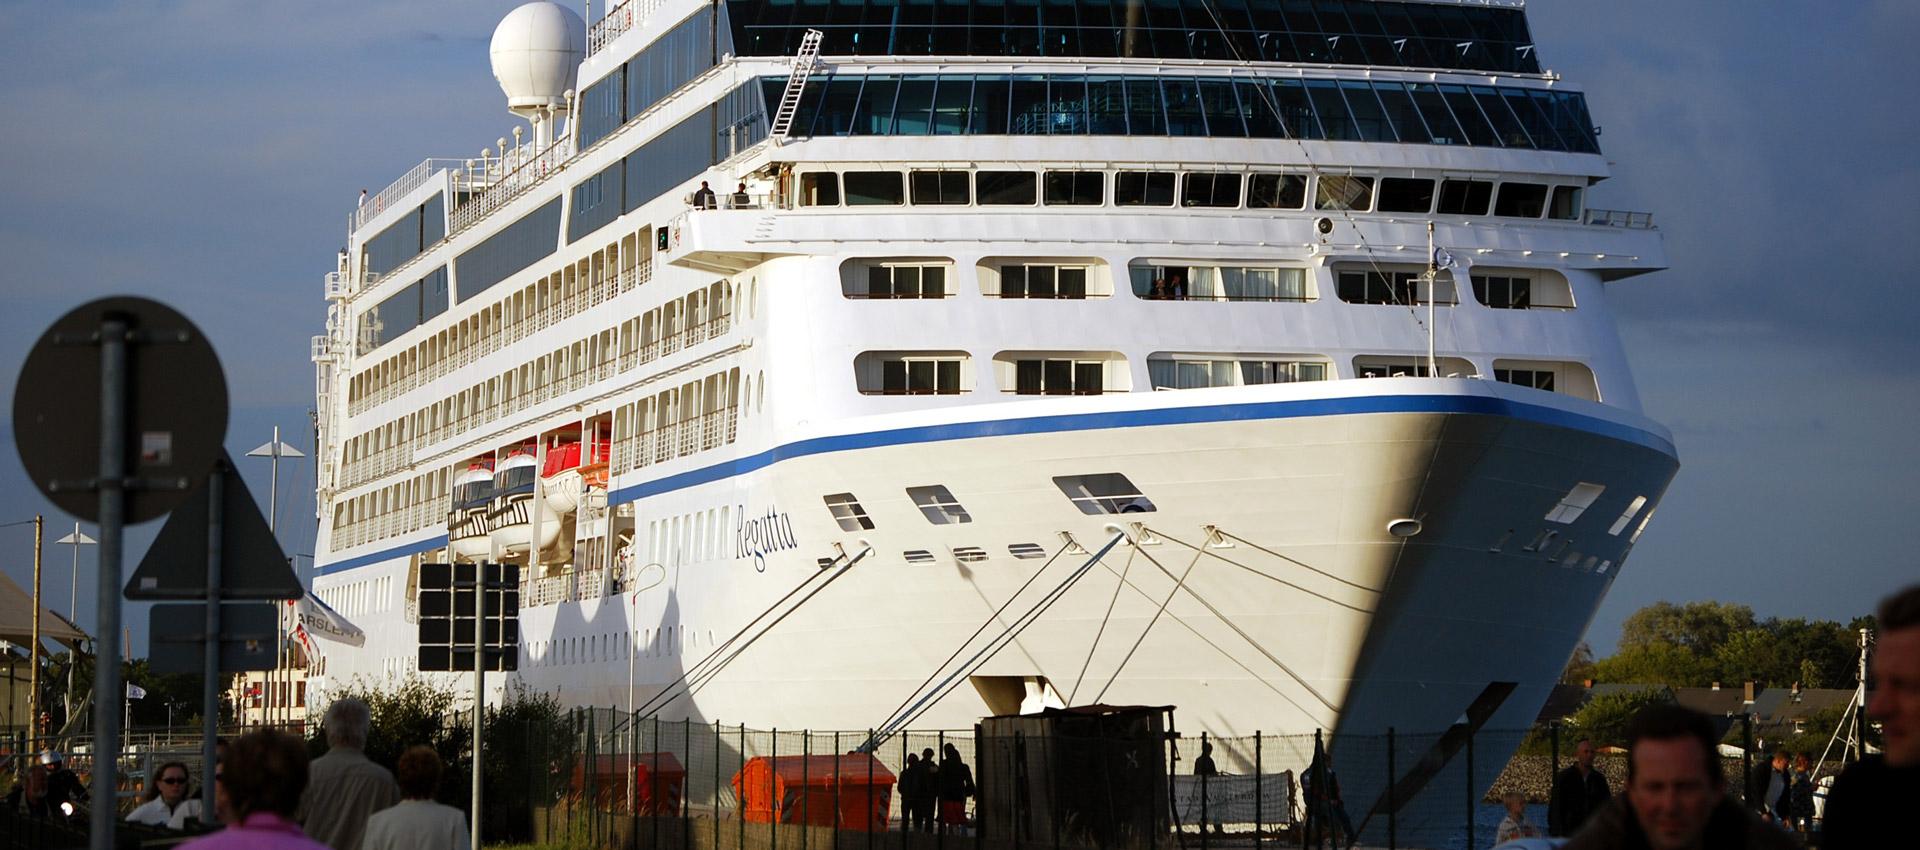 Ship for berlin shore excursions